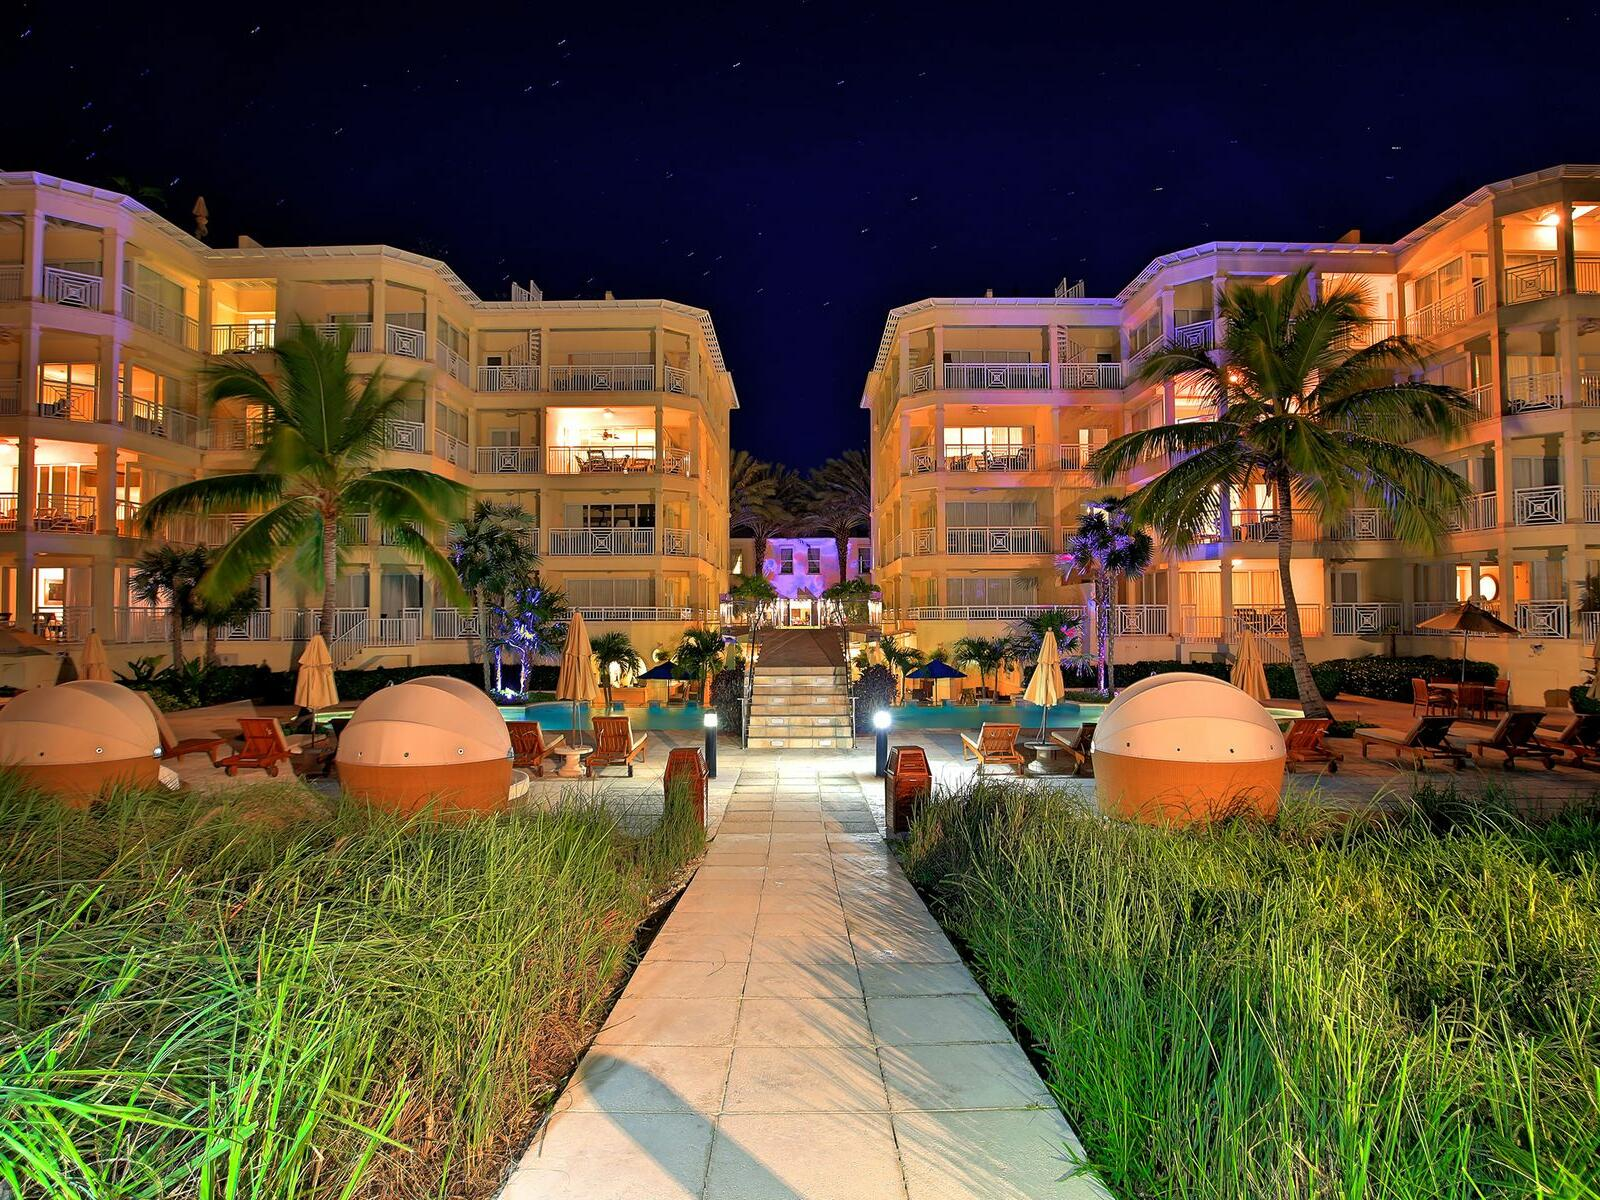 Stargazer Restuarant at night in Windsong Resort On The Reef